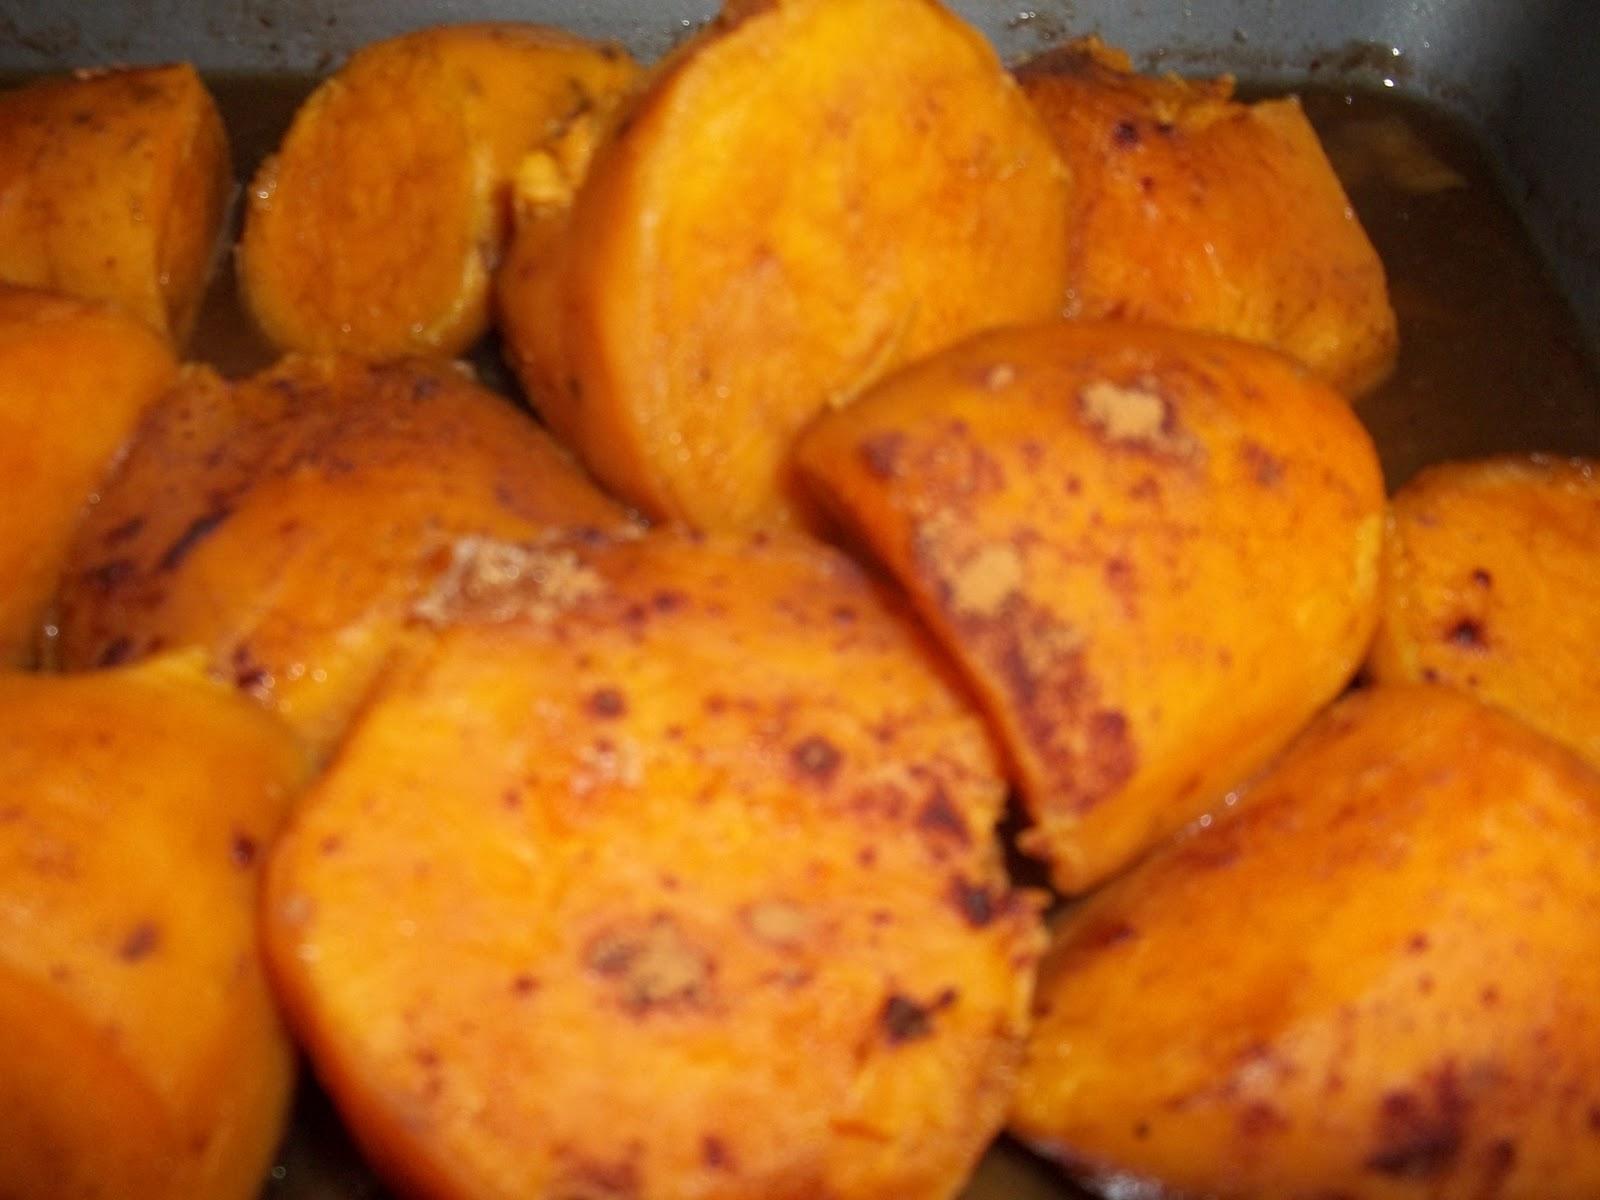 ... Recipes: Sensational Sides: Roasted Brown Sugar Glazed Sweet Potato